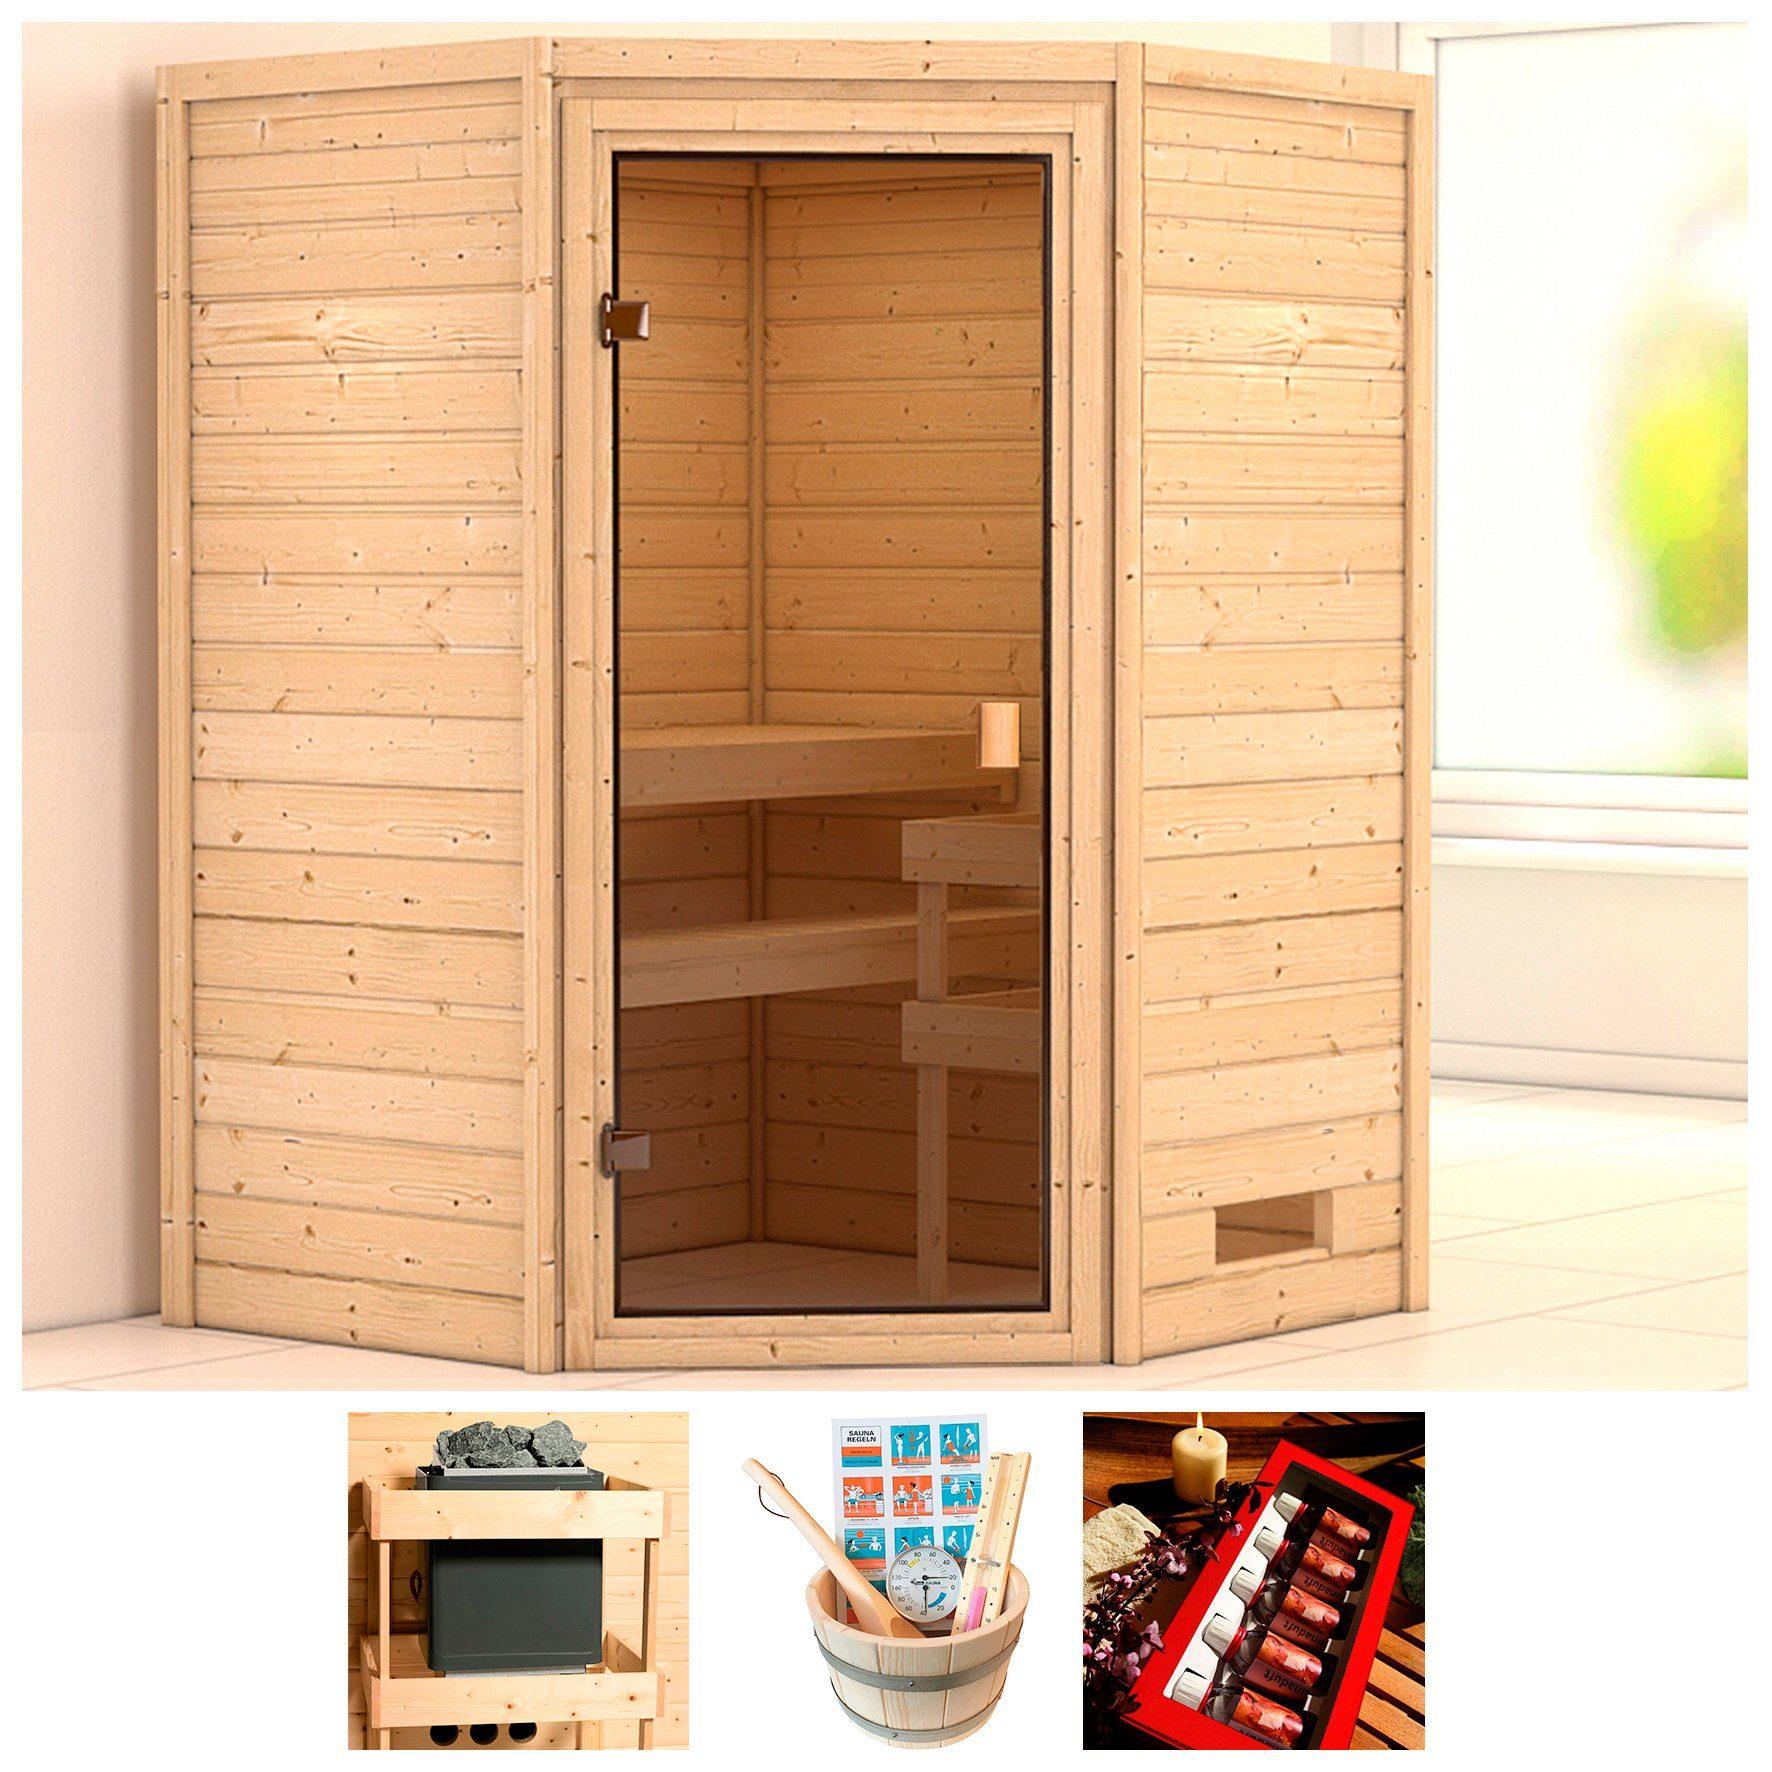 KARIBU Sauna »Wangerooge«, BxTxH: 146x146x187 cm, ohne Ofen